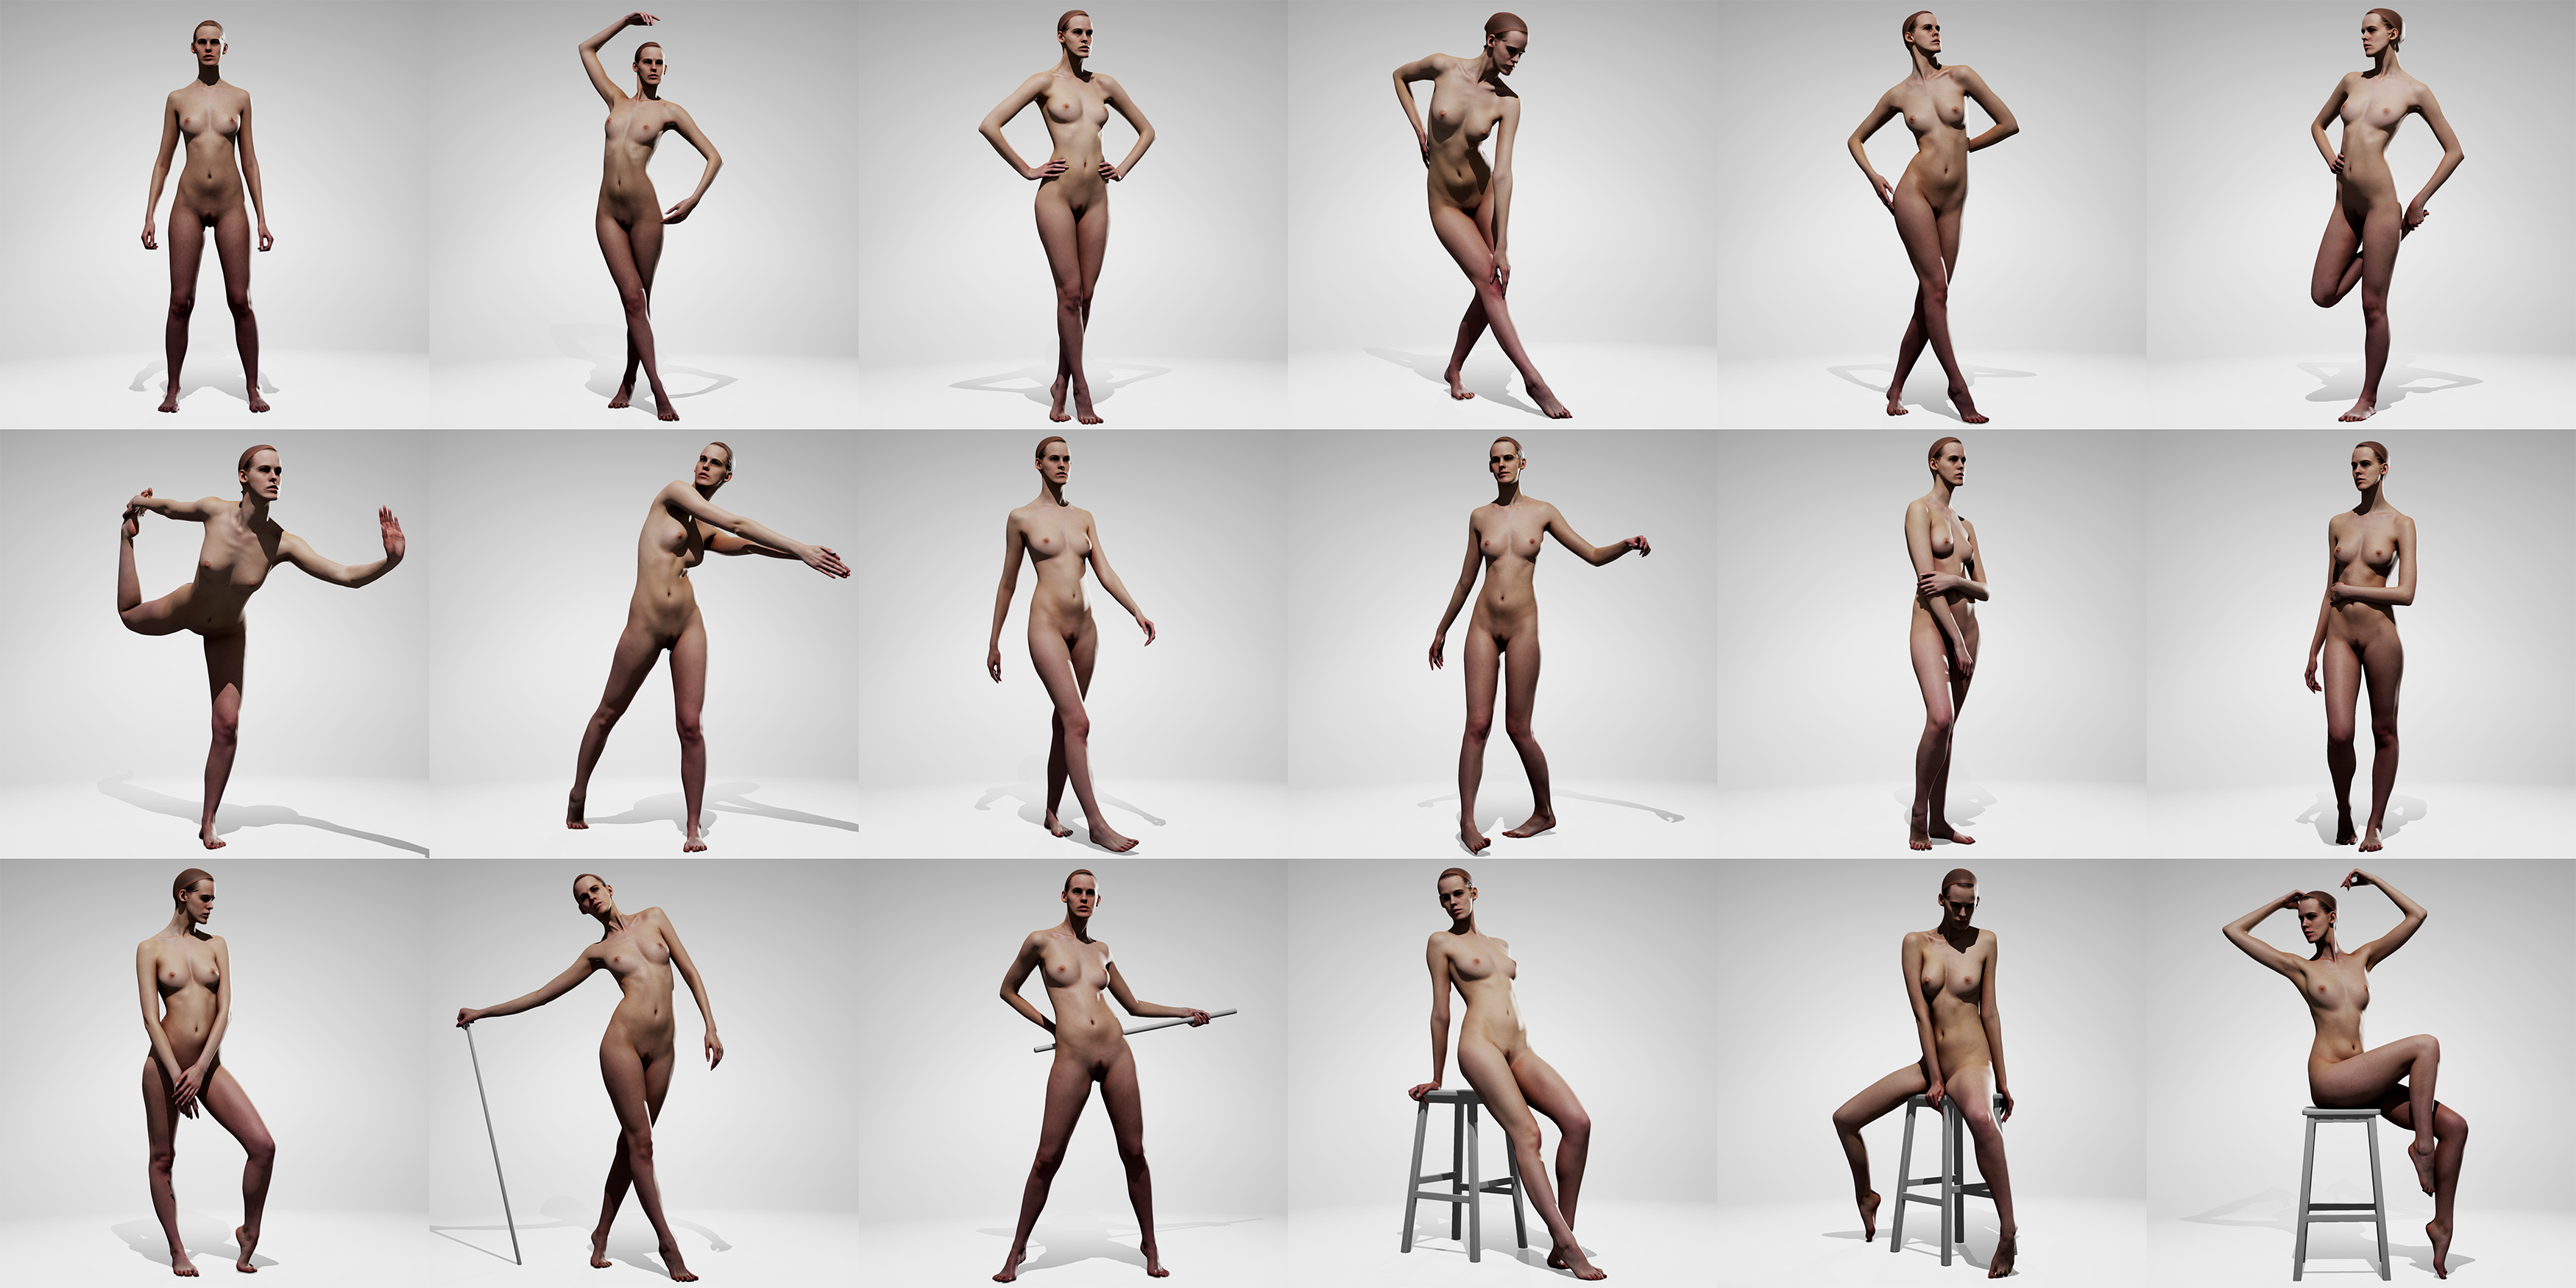 dragon ball girls nude